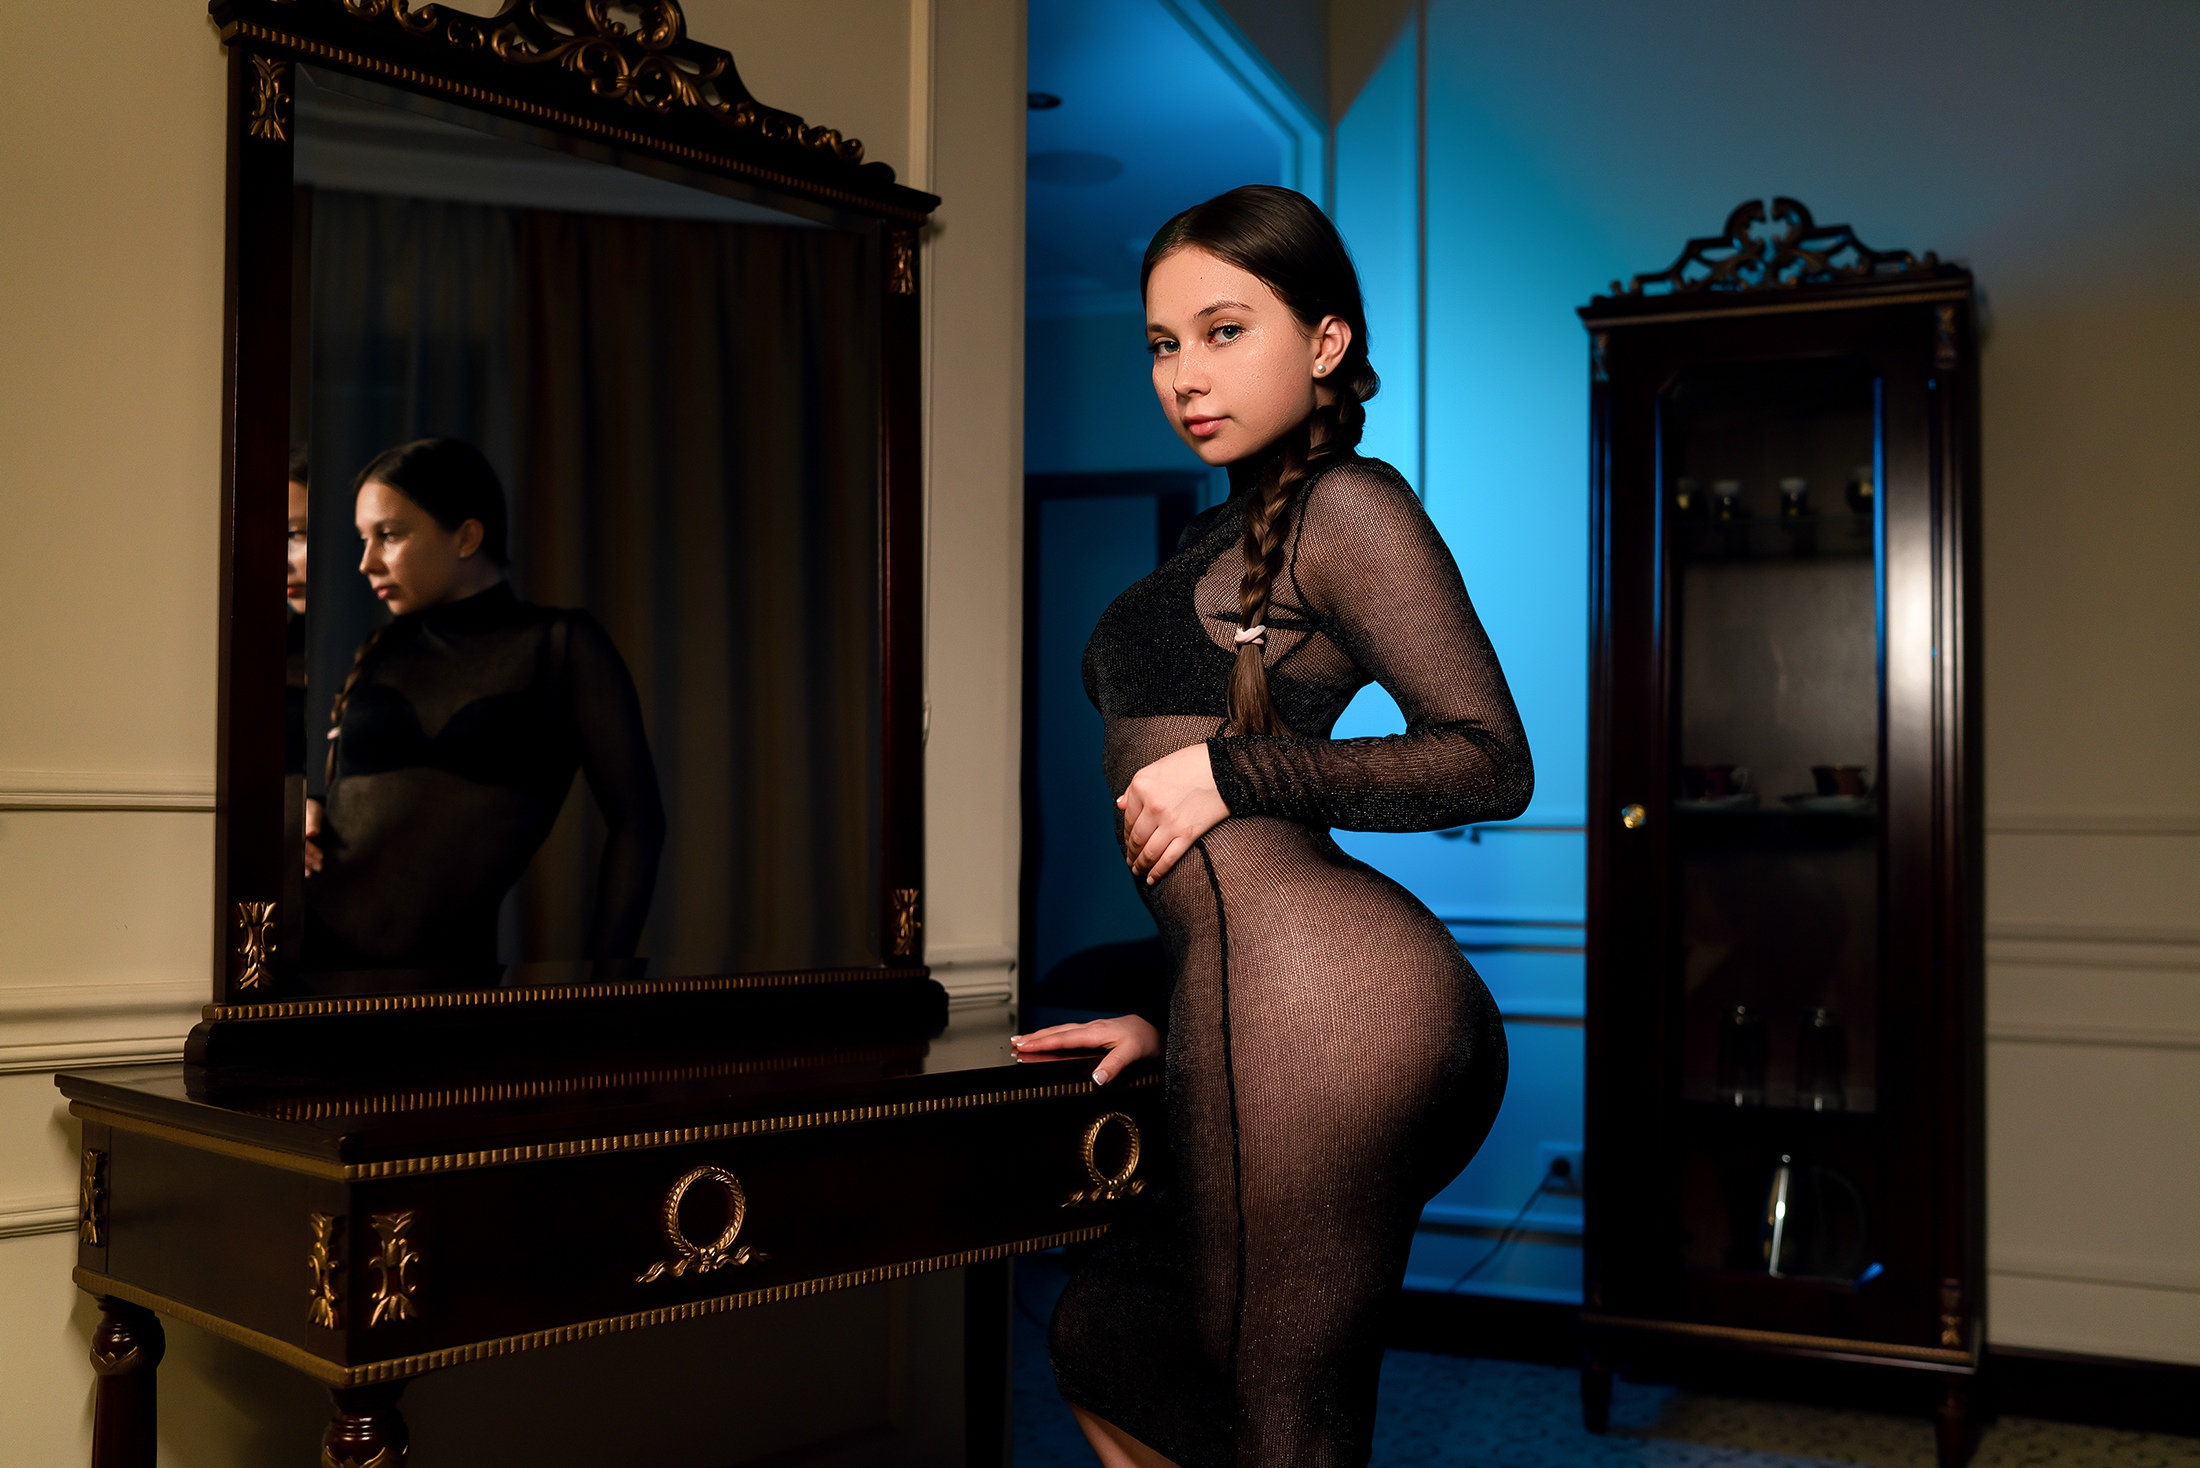 People 2200x1468 women black dress ass ponytail mirror reflection see-through dress black bras women indoors looking at viewer